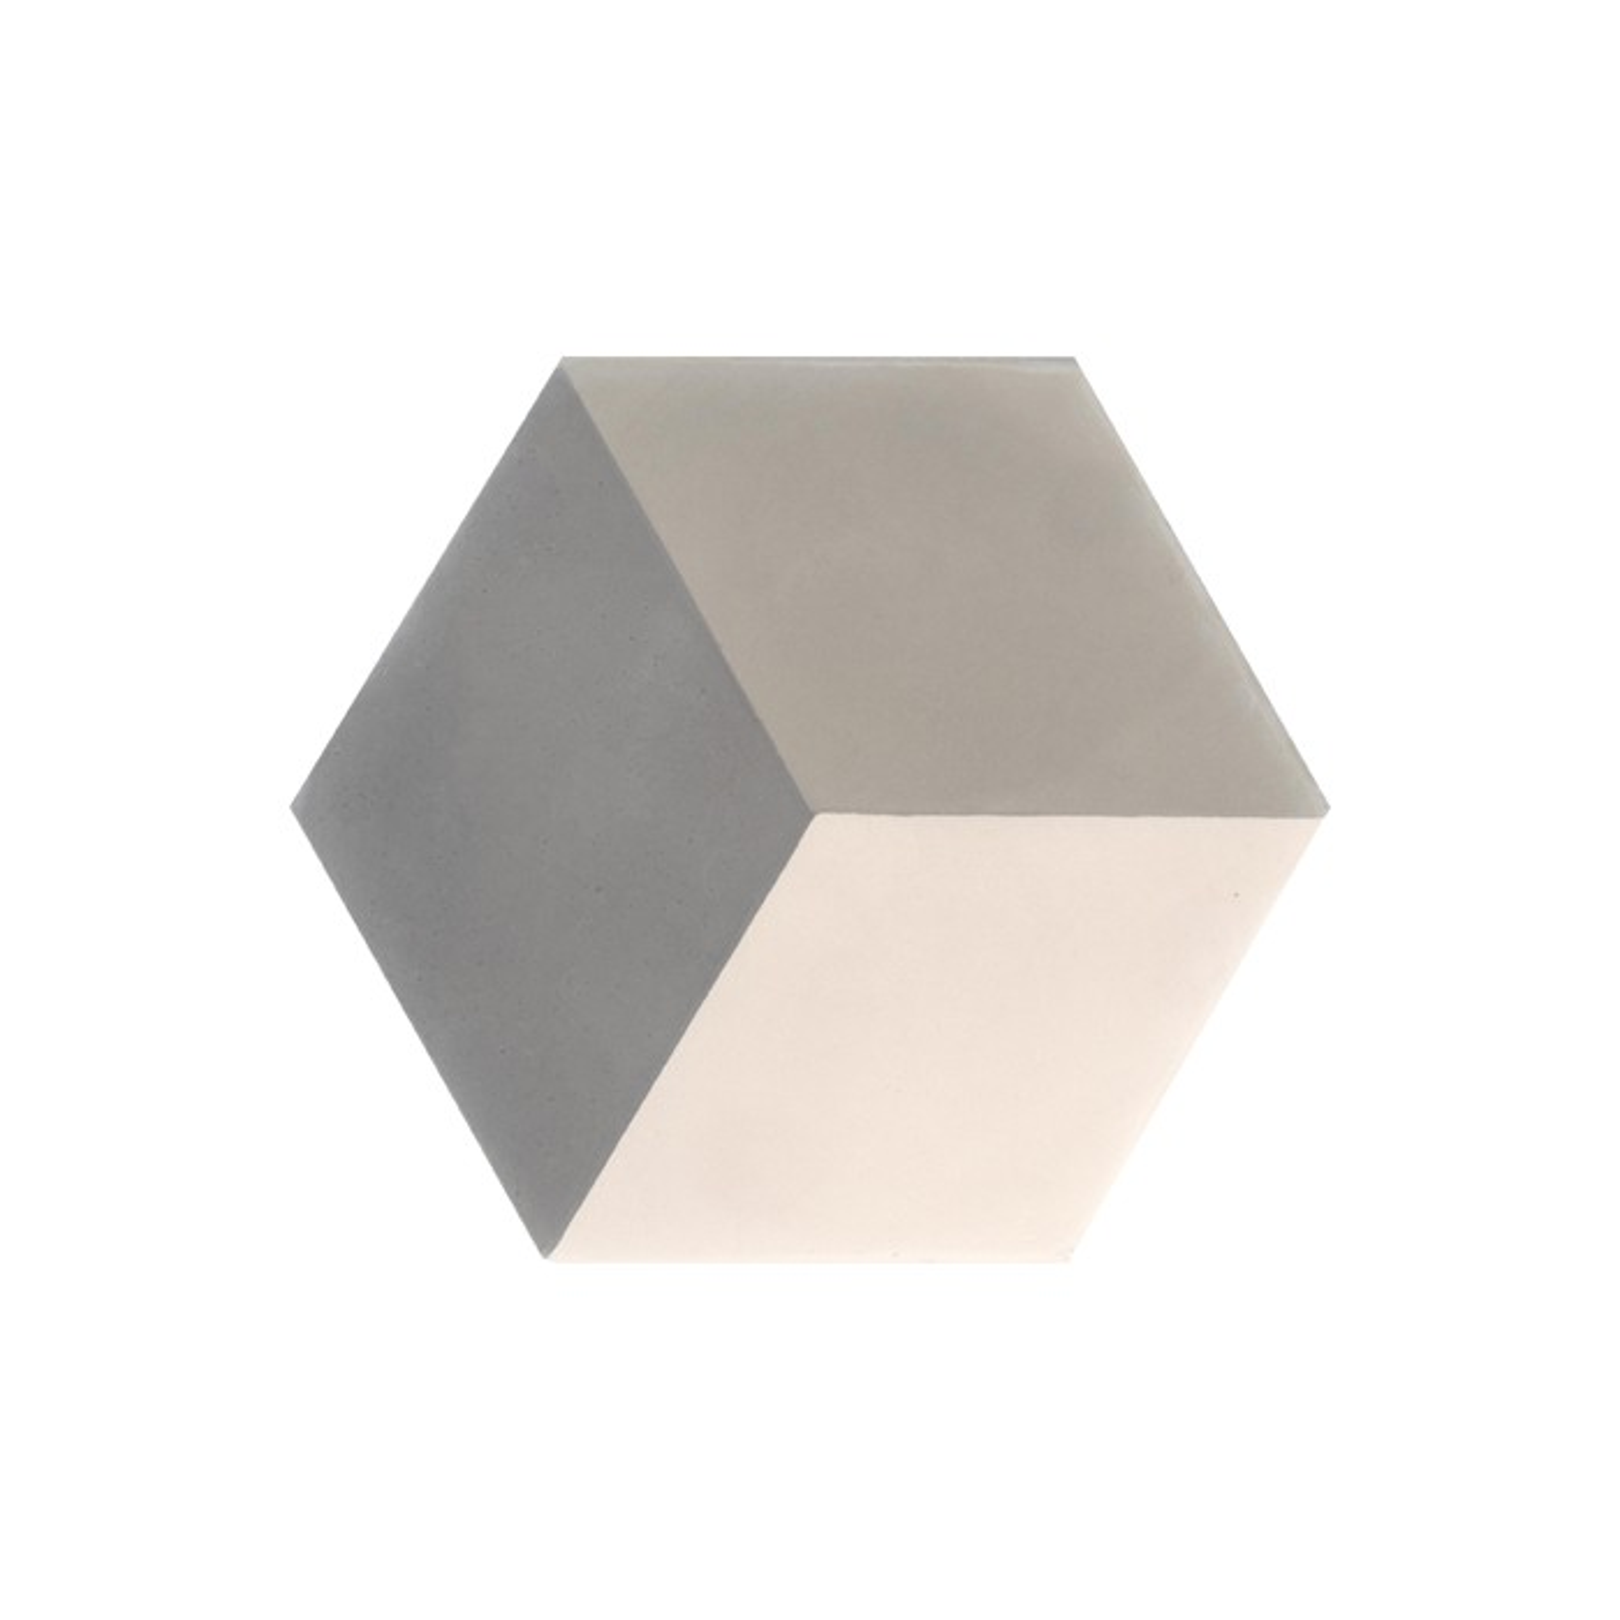 carreau de ciment color hexagone motif cube 3d. Black Bedroom Furniture Sets. Home Design Ideas